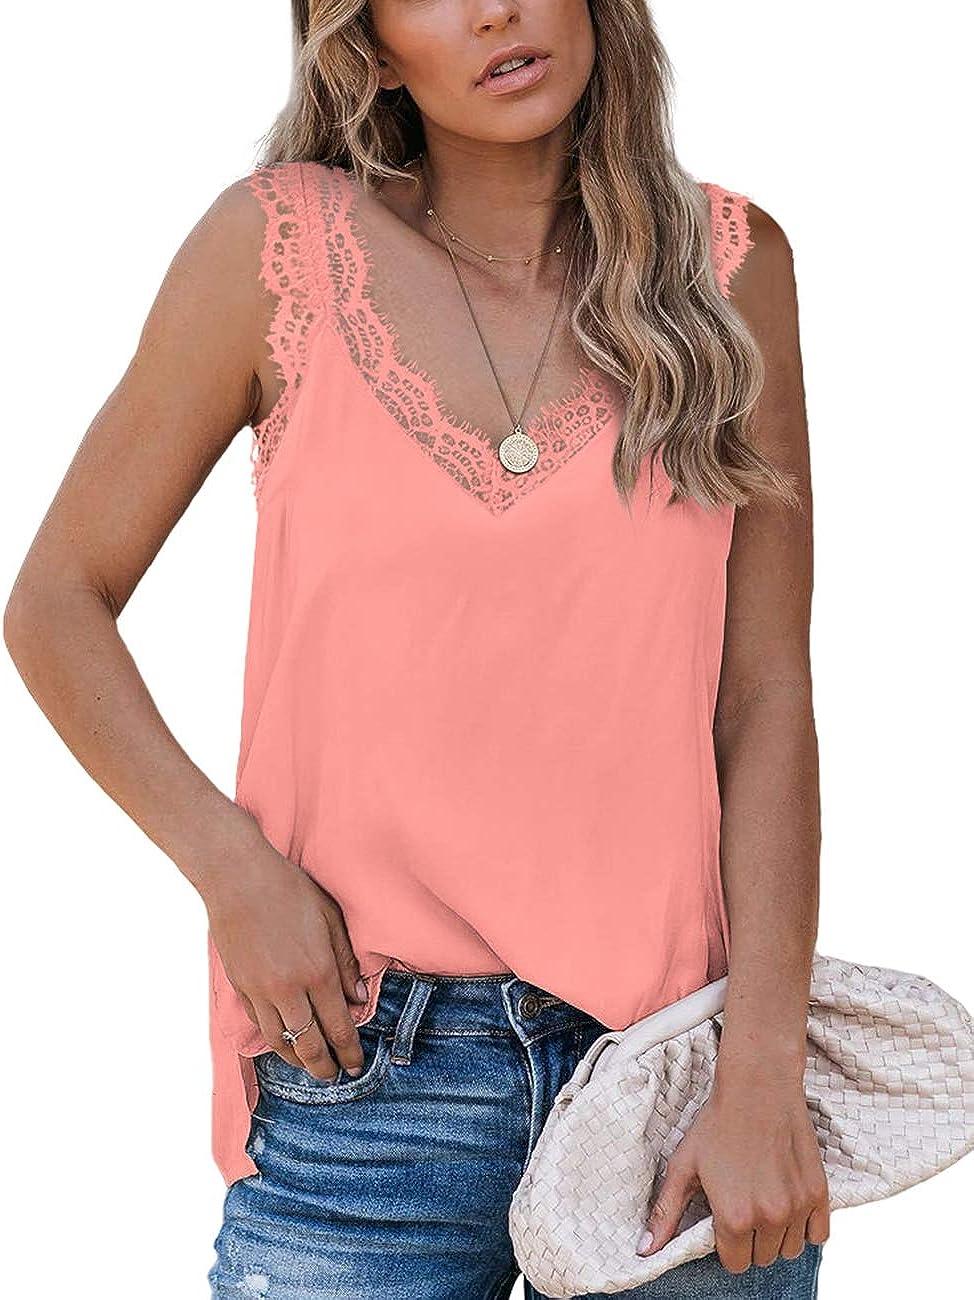 Aokosor Womens V Neck Lace Tank Tops Summer Casual Loose Sleeveless Shirts Side Split